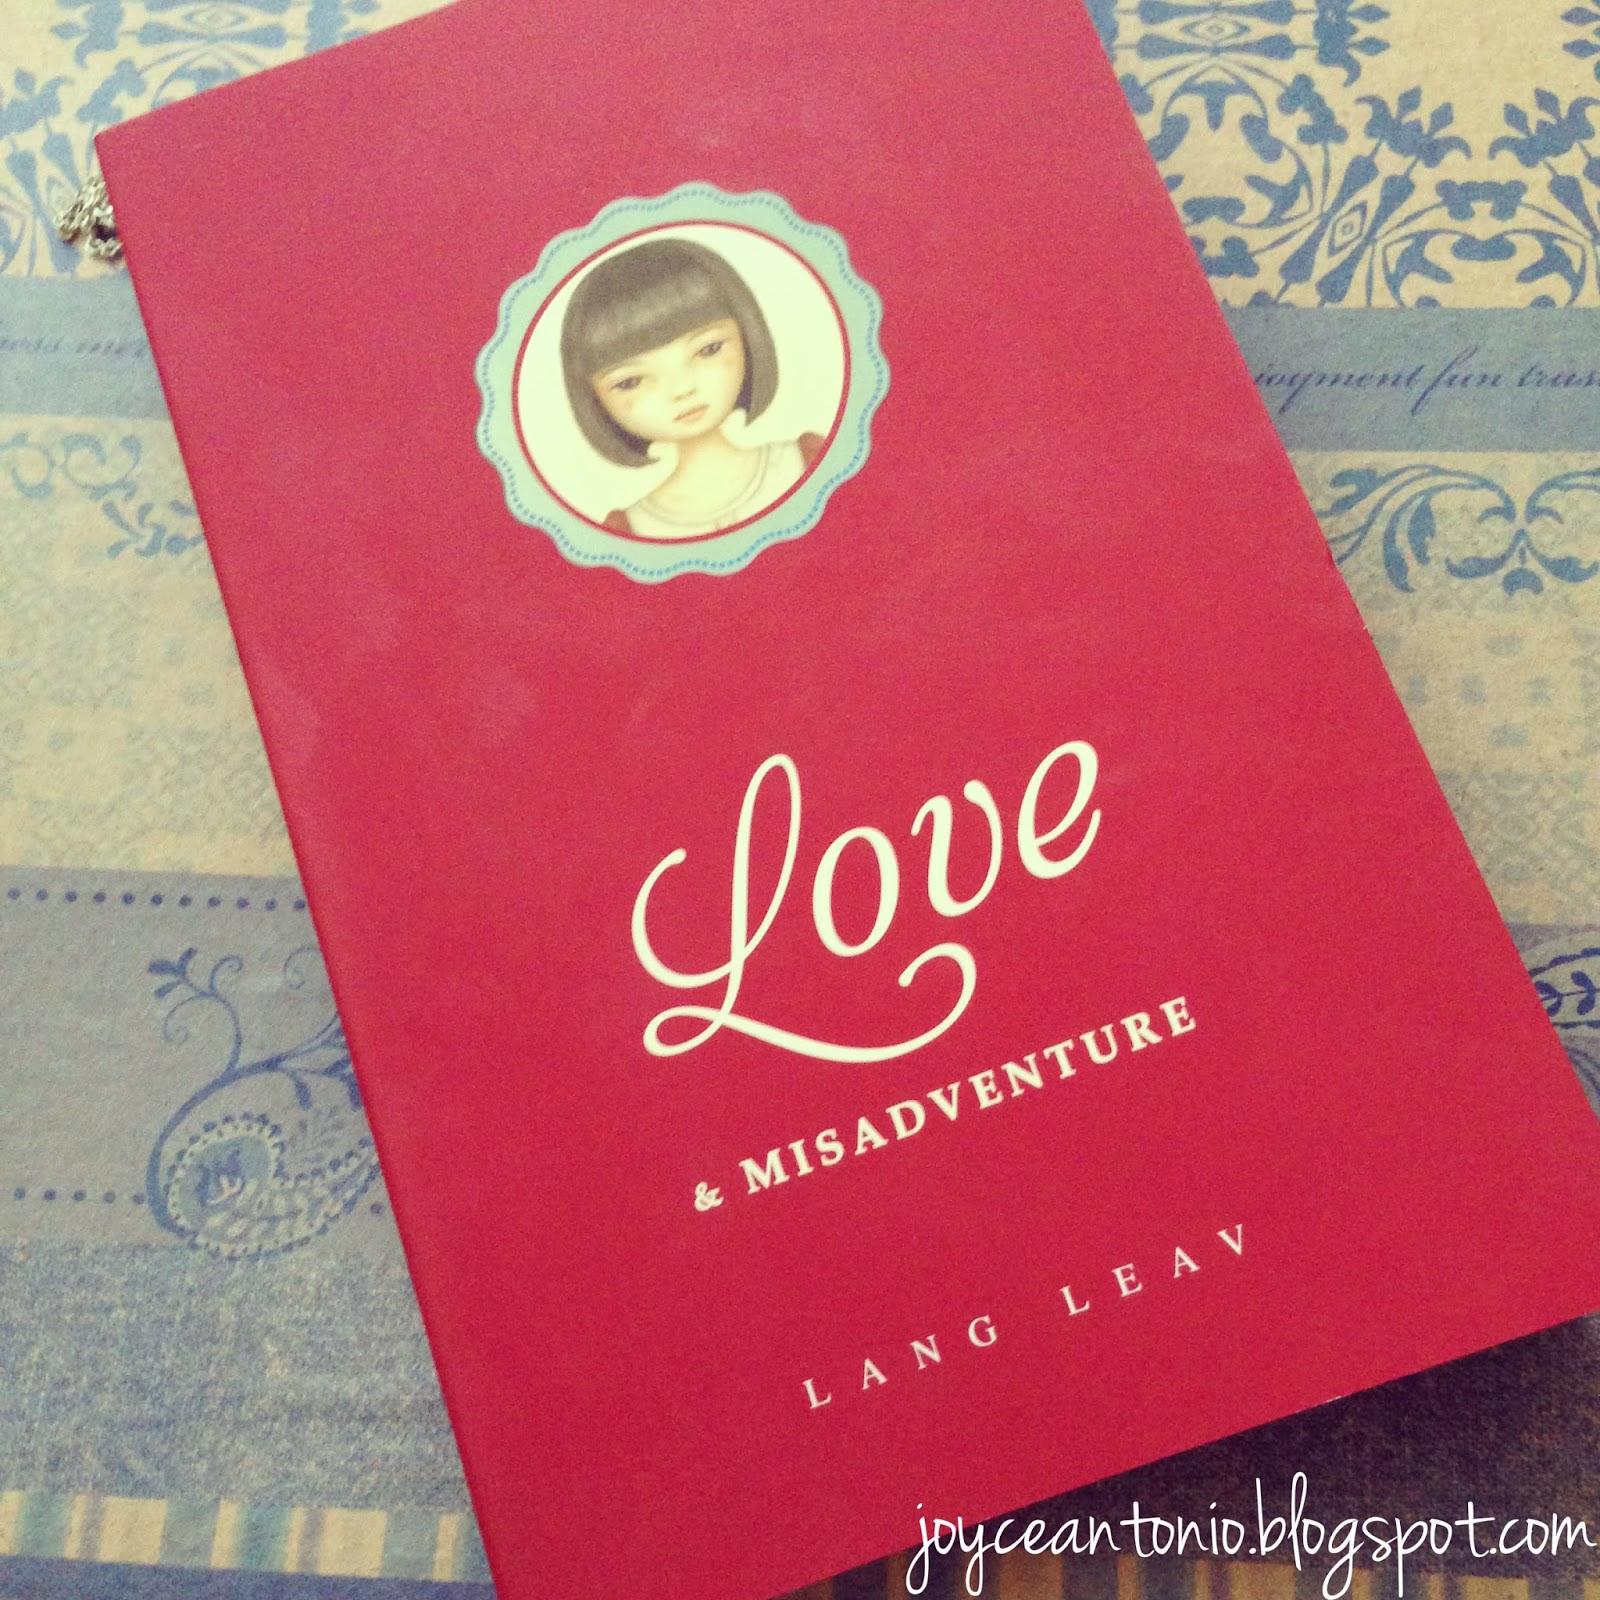 love and misadventure by lang leav pdf